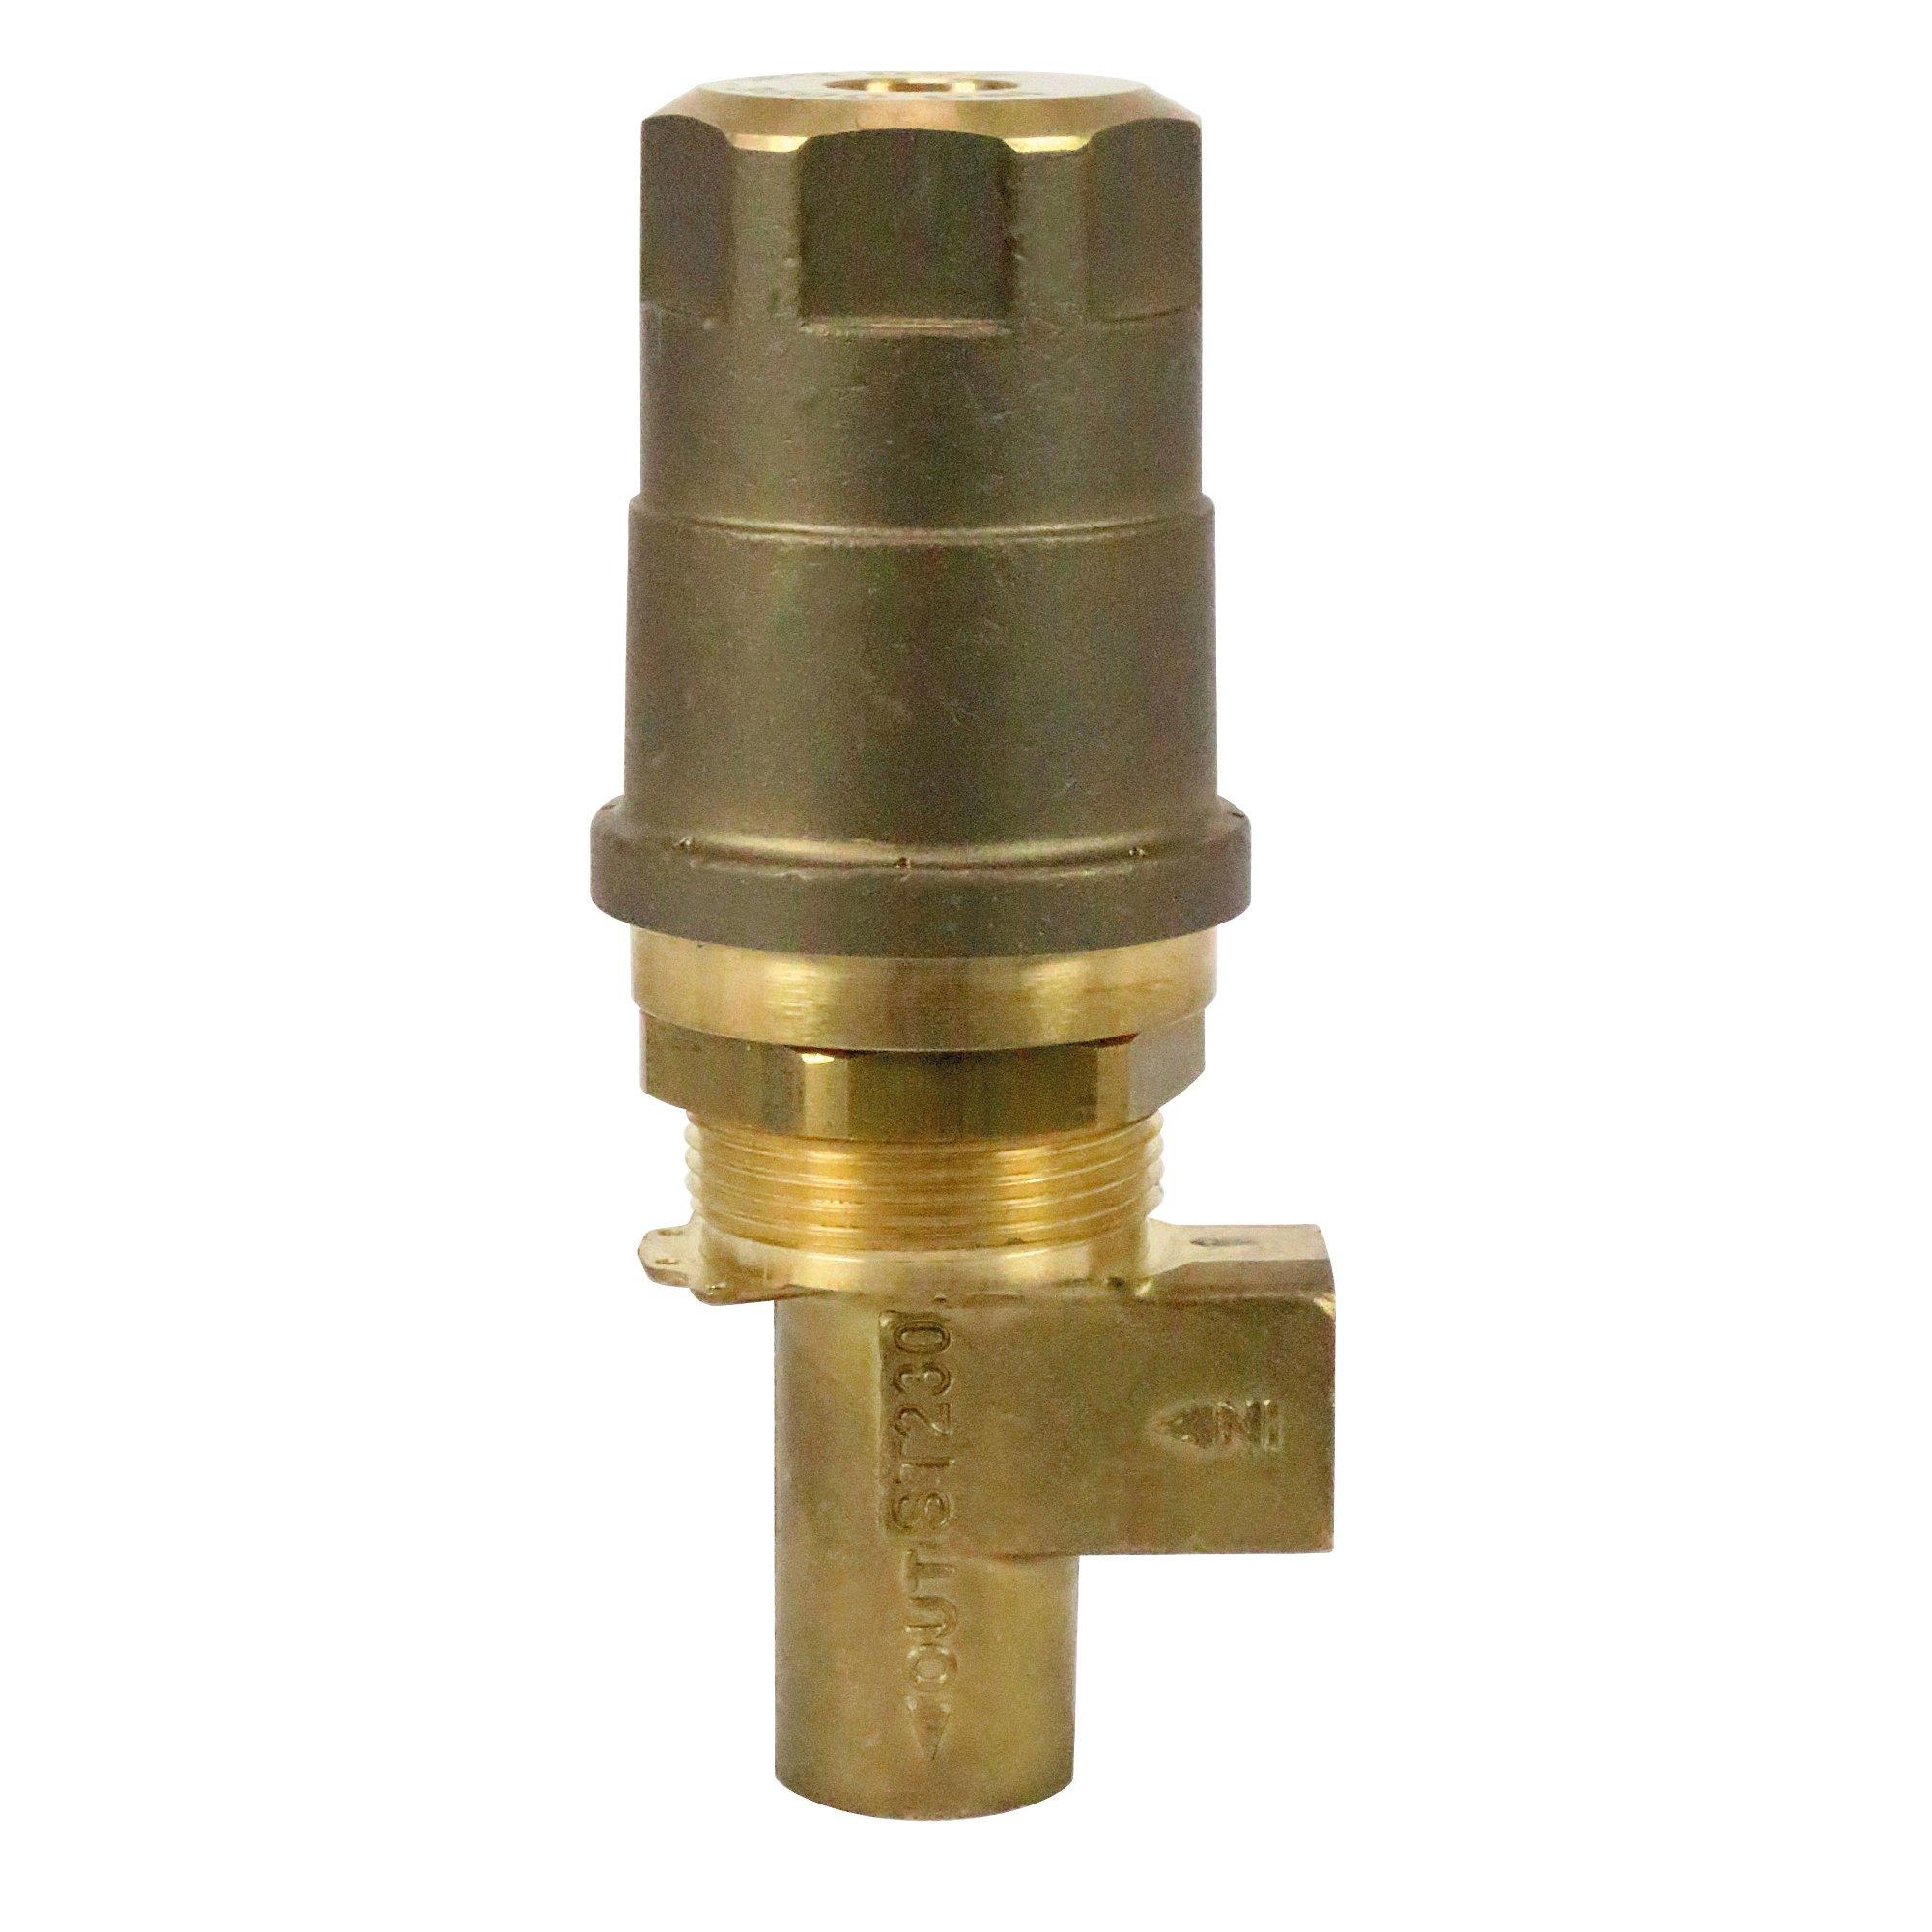 Suttner Sicherheitsventil ST-230, max. 250 bar, max. 30 L/min, max. 95°C Druckbegrenzungsventil ST-230 250 bar G1/4